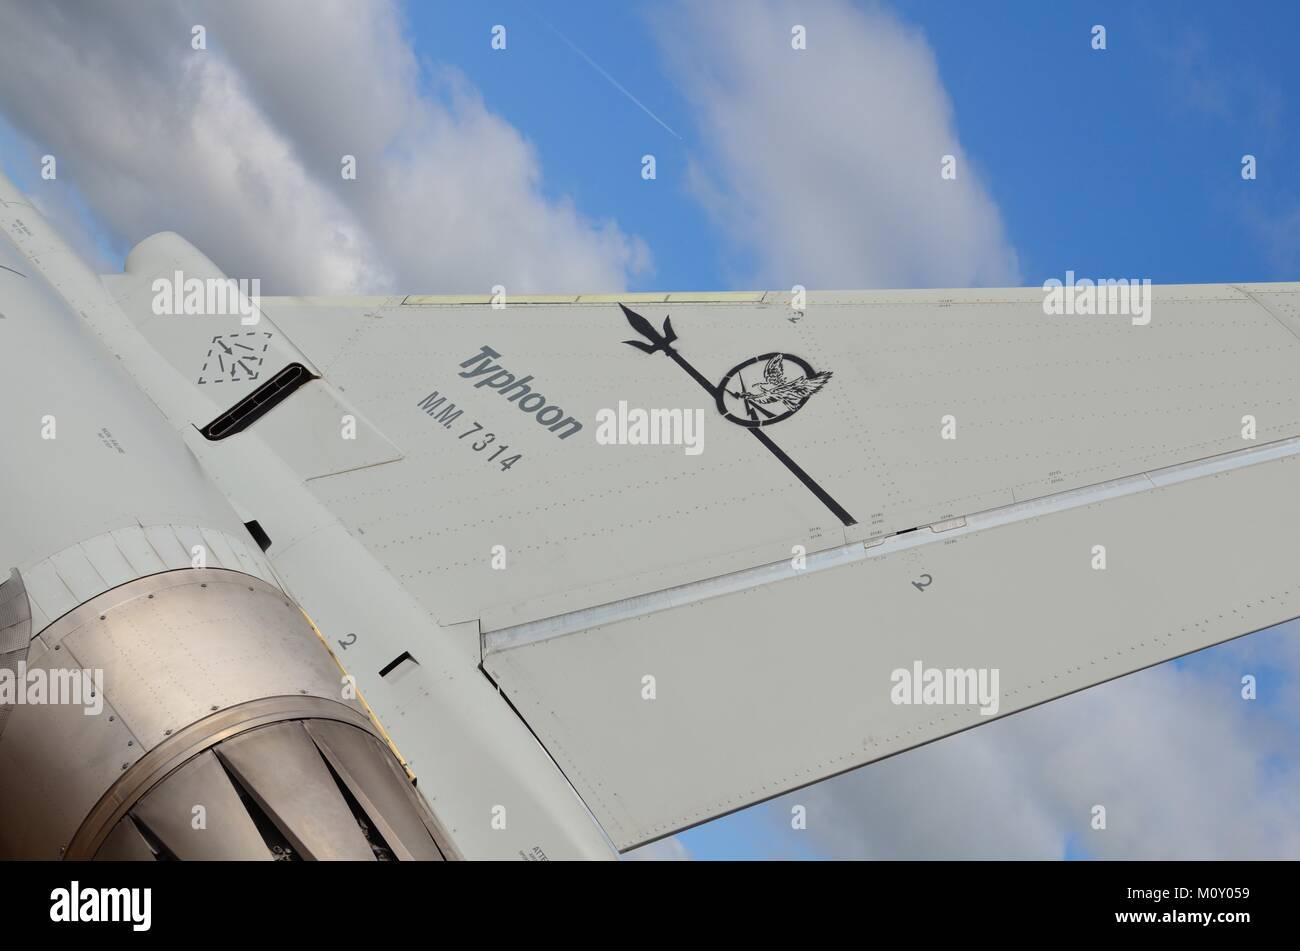 Eurofighter Typhoon Tailplane Details - Stock Image